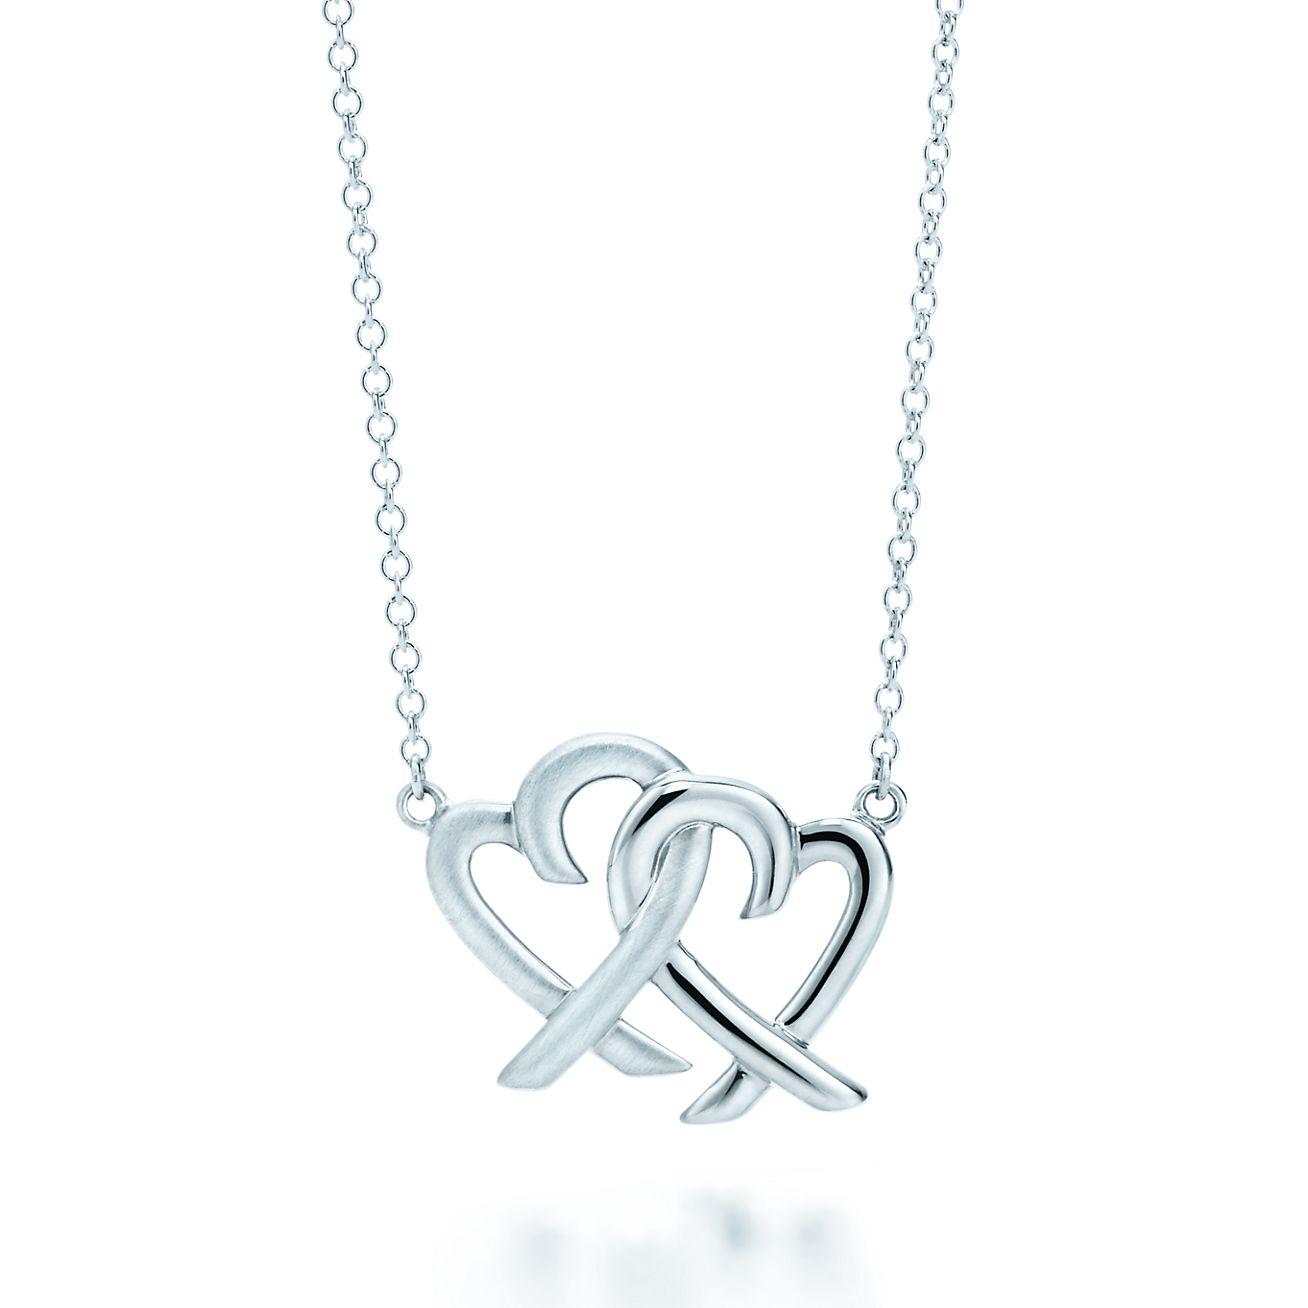 Paloma Picasso Loving Heart interlocking pendant in sterling silver Tiffany & Co.